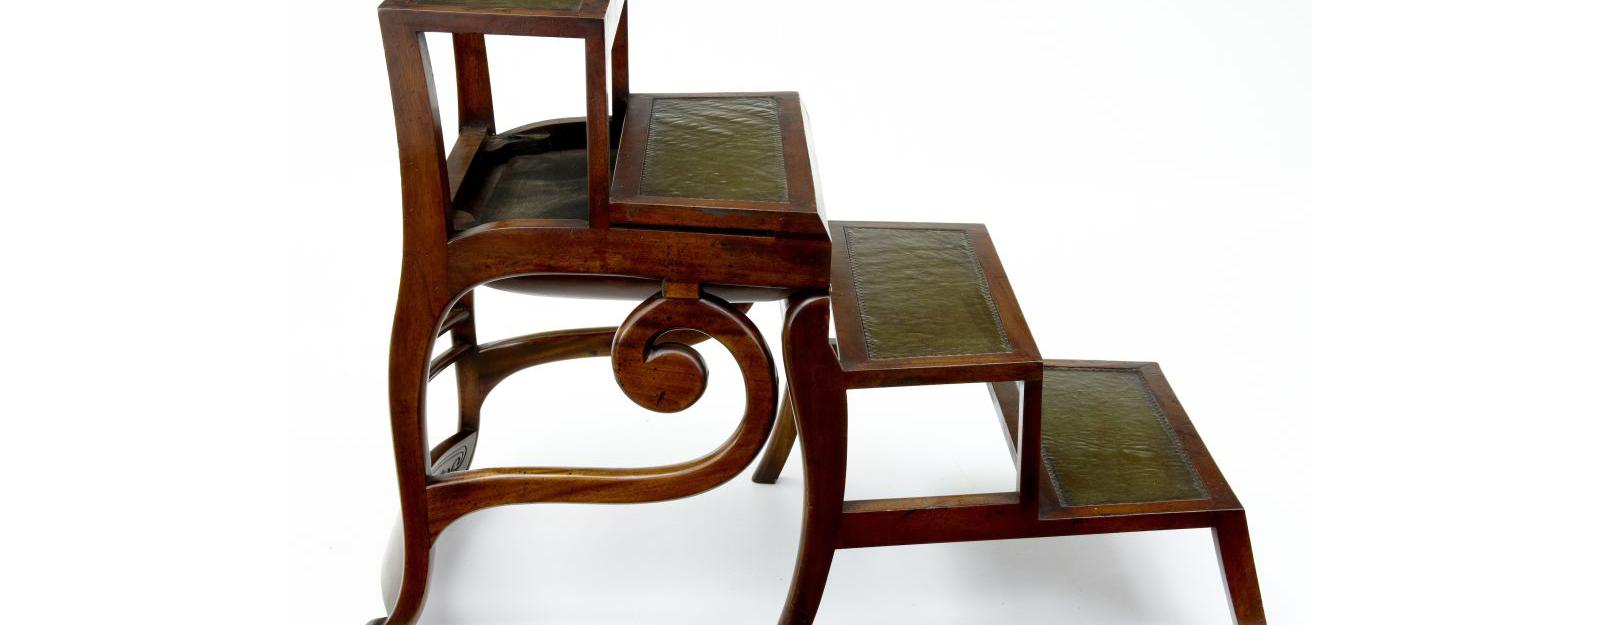 Fabulous Different Design Approaches To The Transforming Library Inzonedesignstudio Interior Chair Design Inzonedesignstudiocom